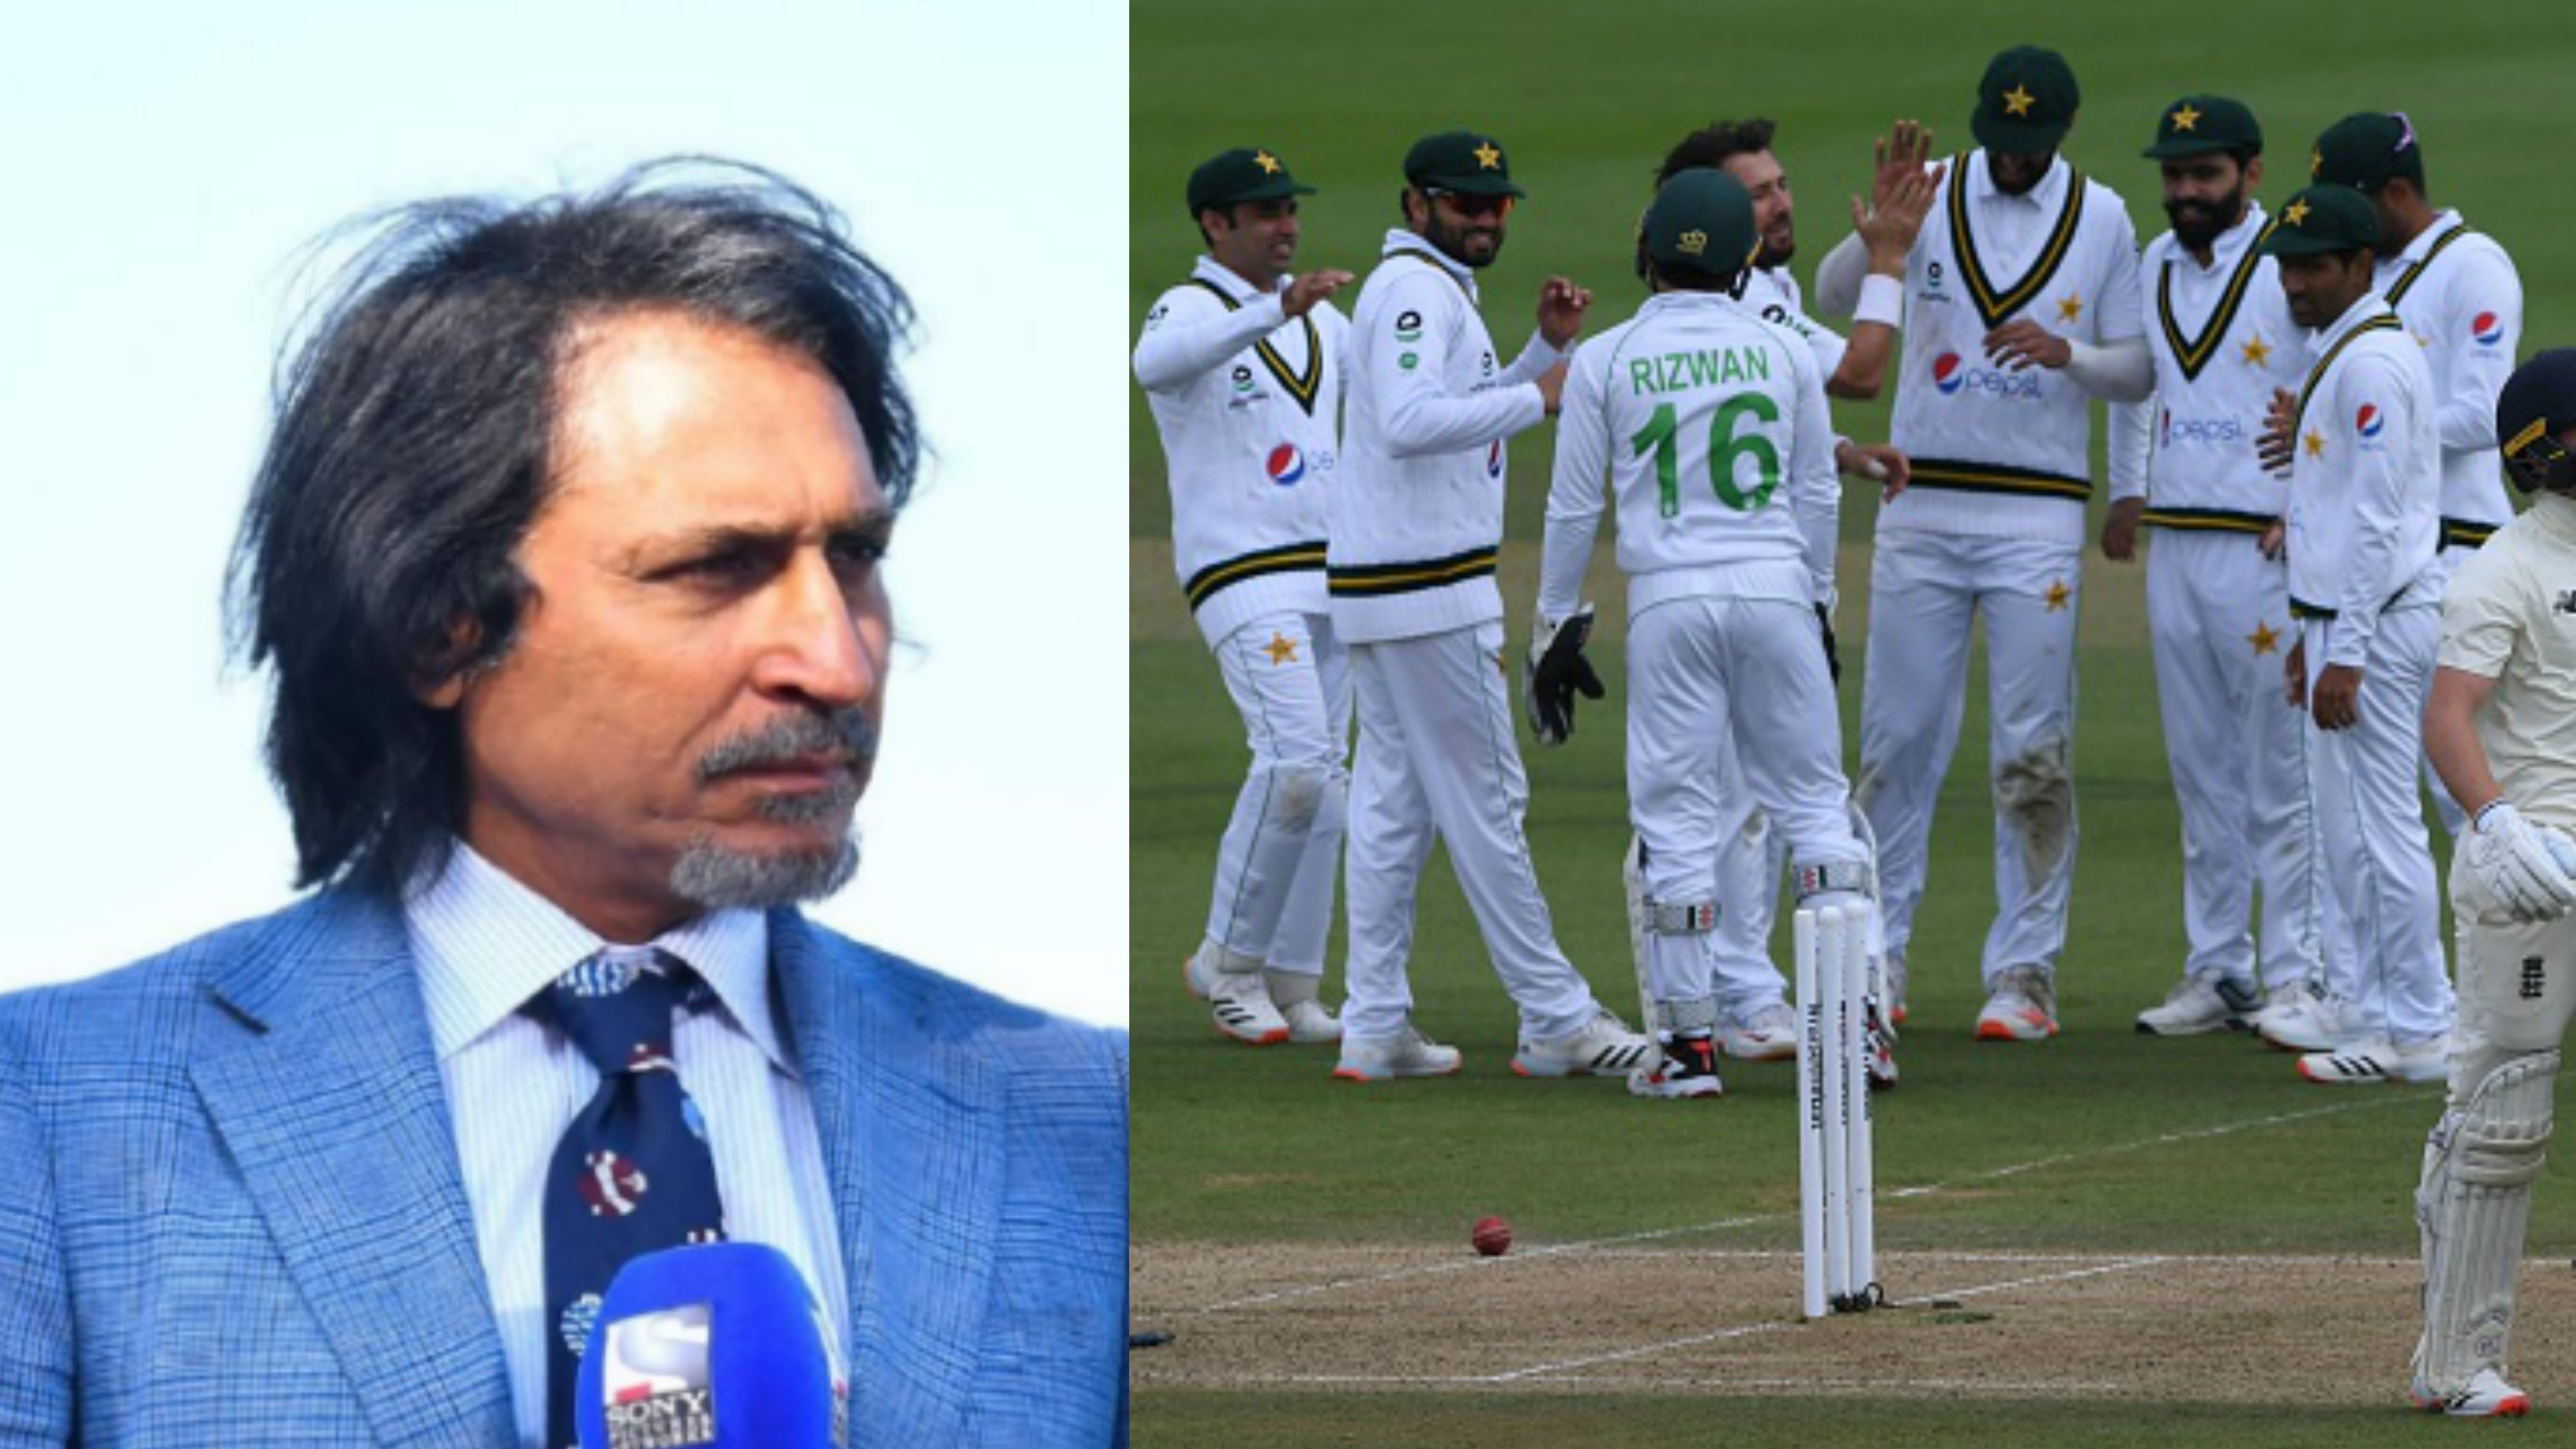 ENG v PAK2020: Ramiz Raja launches attacks on senior players post England Test series defeat